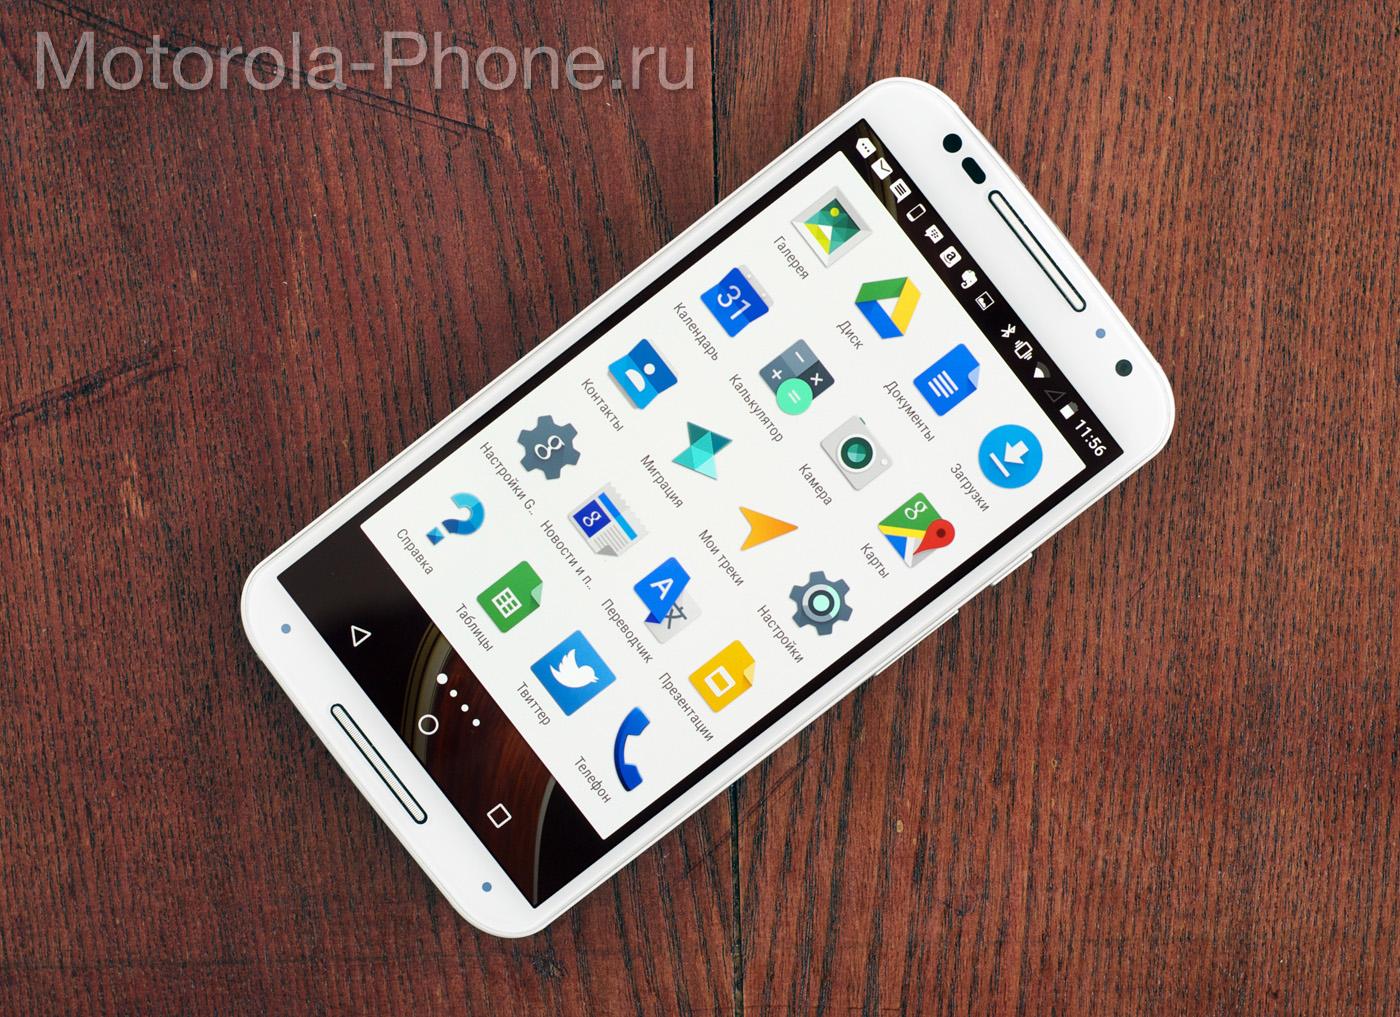 Motorola-Moto-X-05